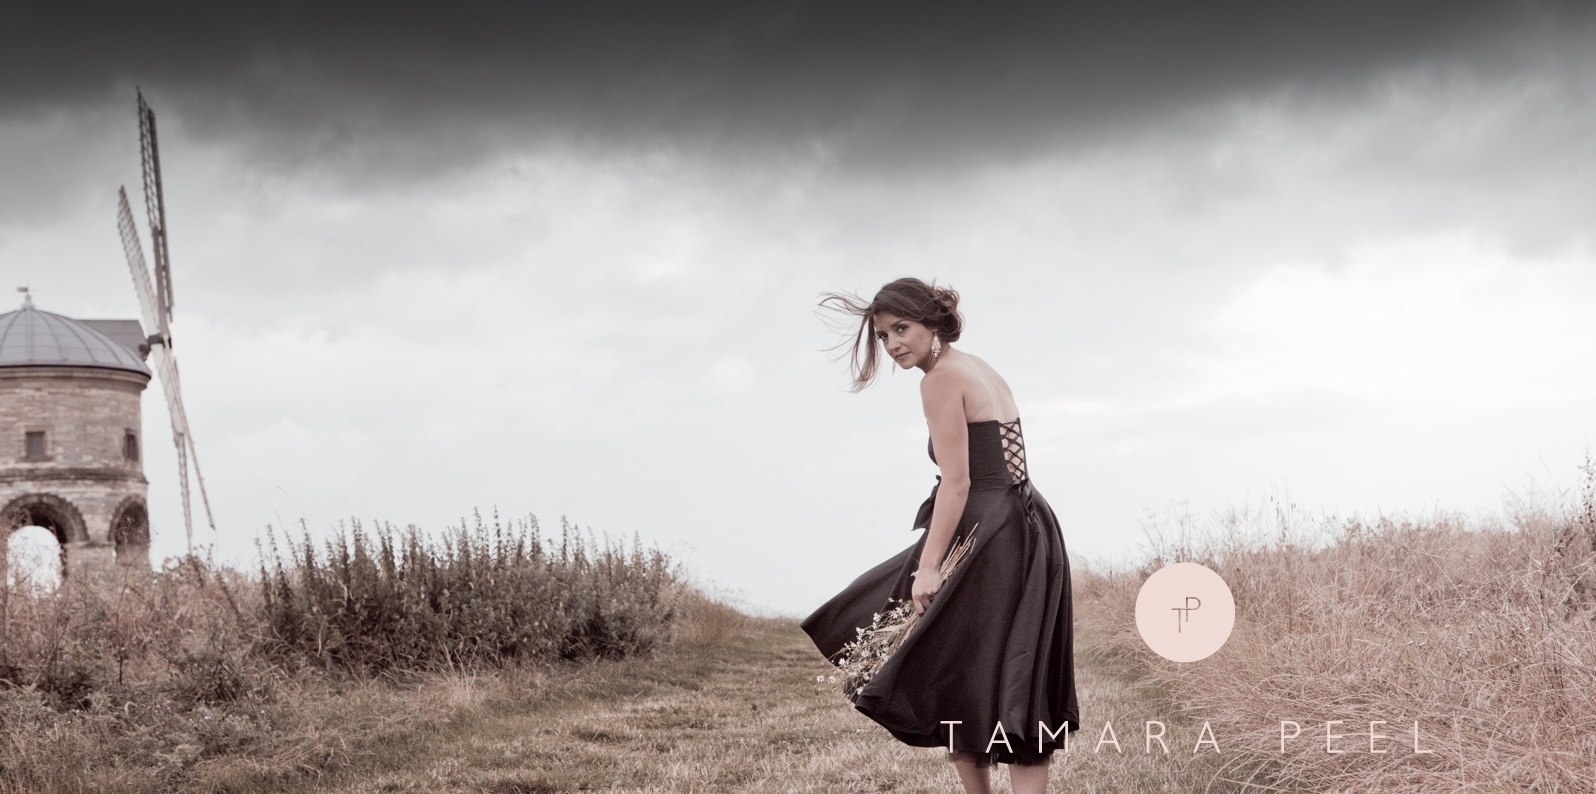 Tamara Peel. V,Macken,photographer,female_0154